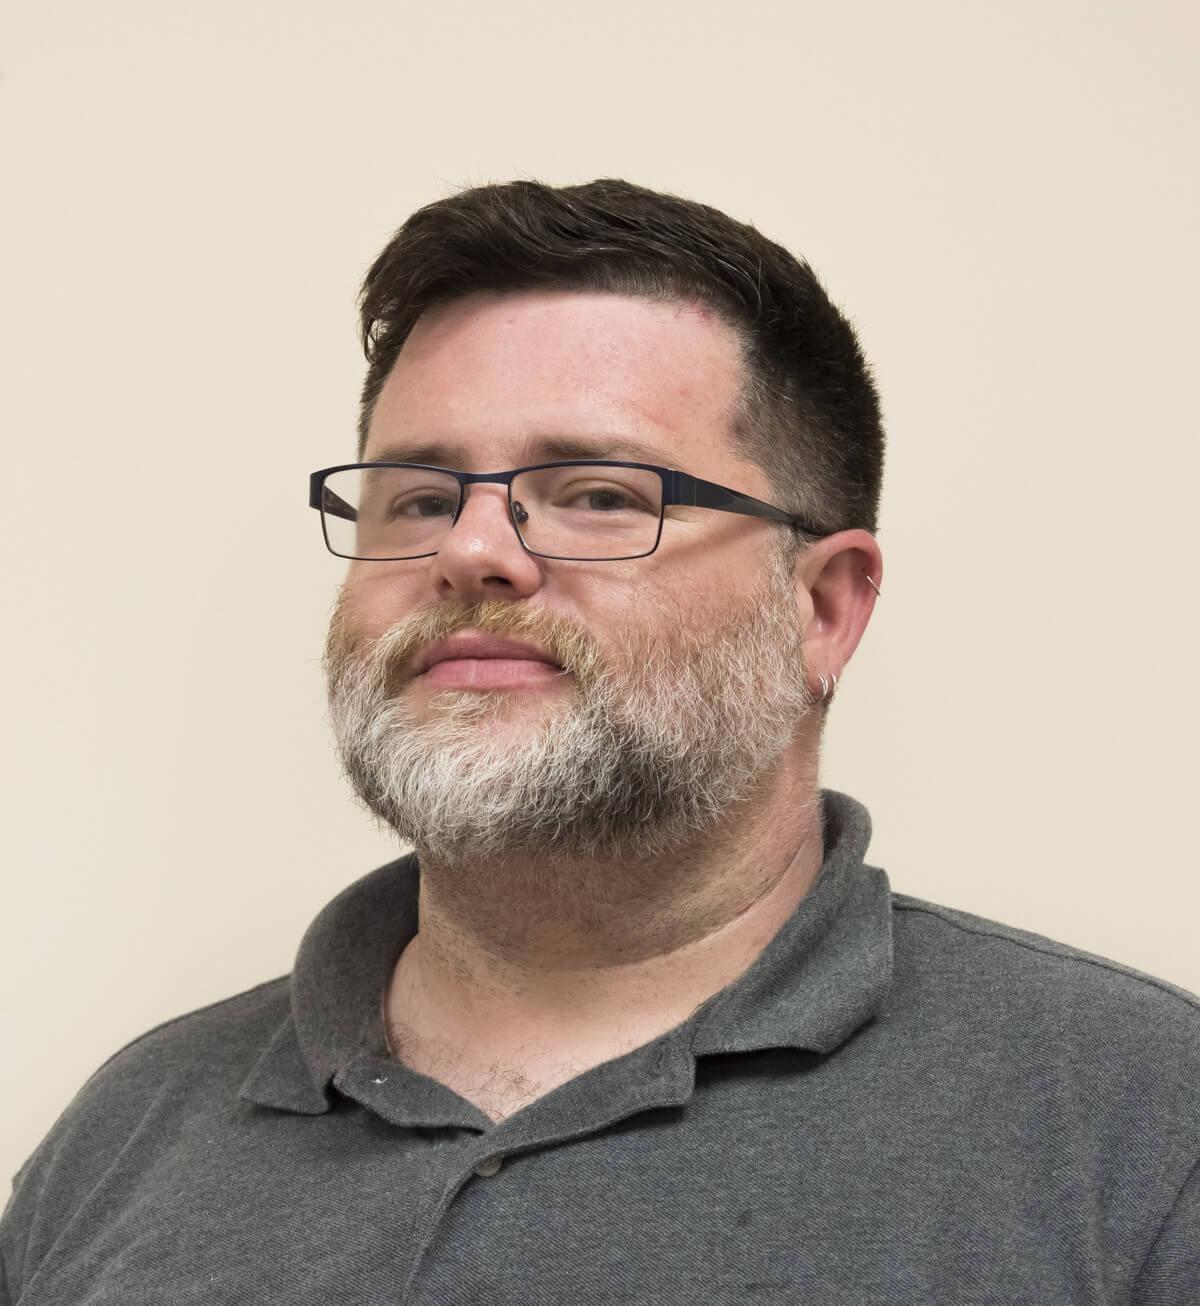 Jesse Kahn